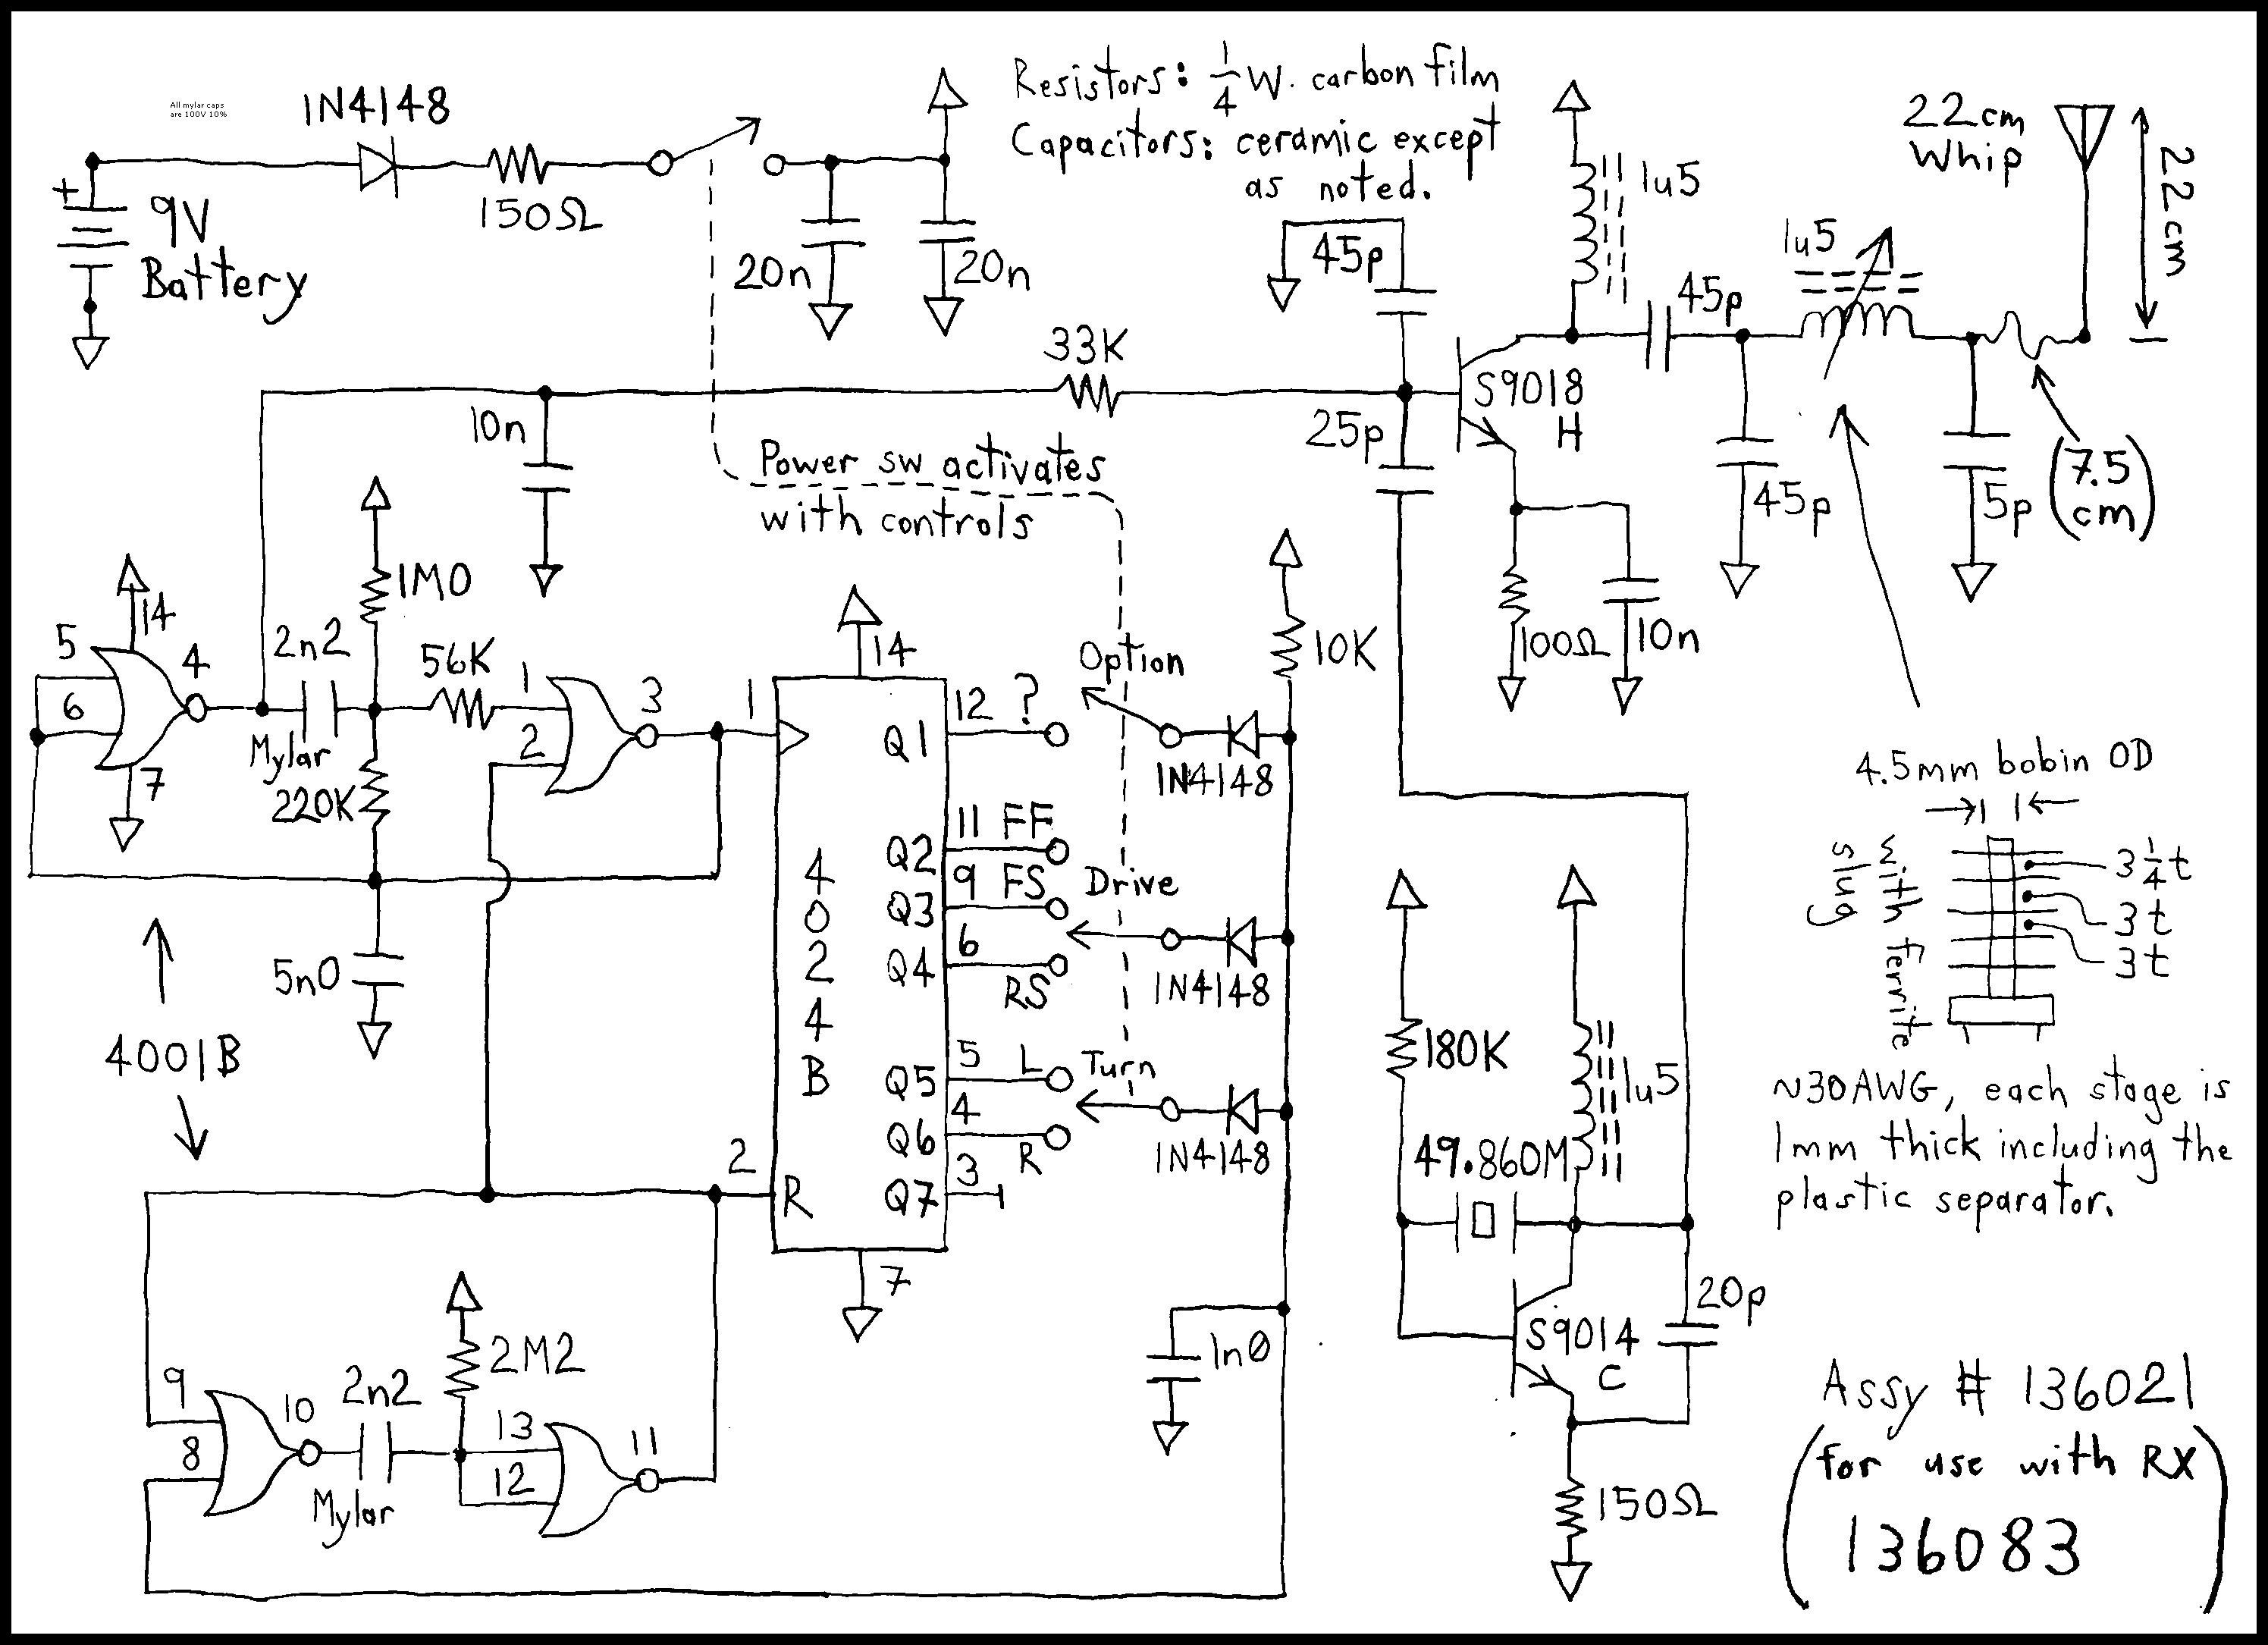 1996 toyota Camry Spark Plug Wire Diagram Inspirational 2009 toyota Camry Coil Diagram toyota Wiring Diagrams